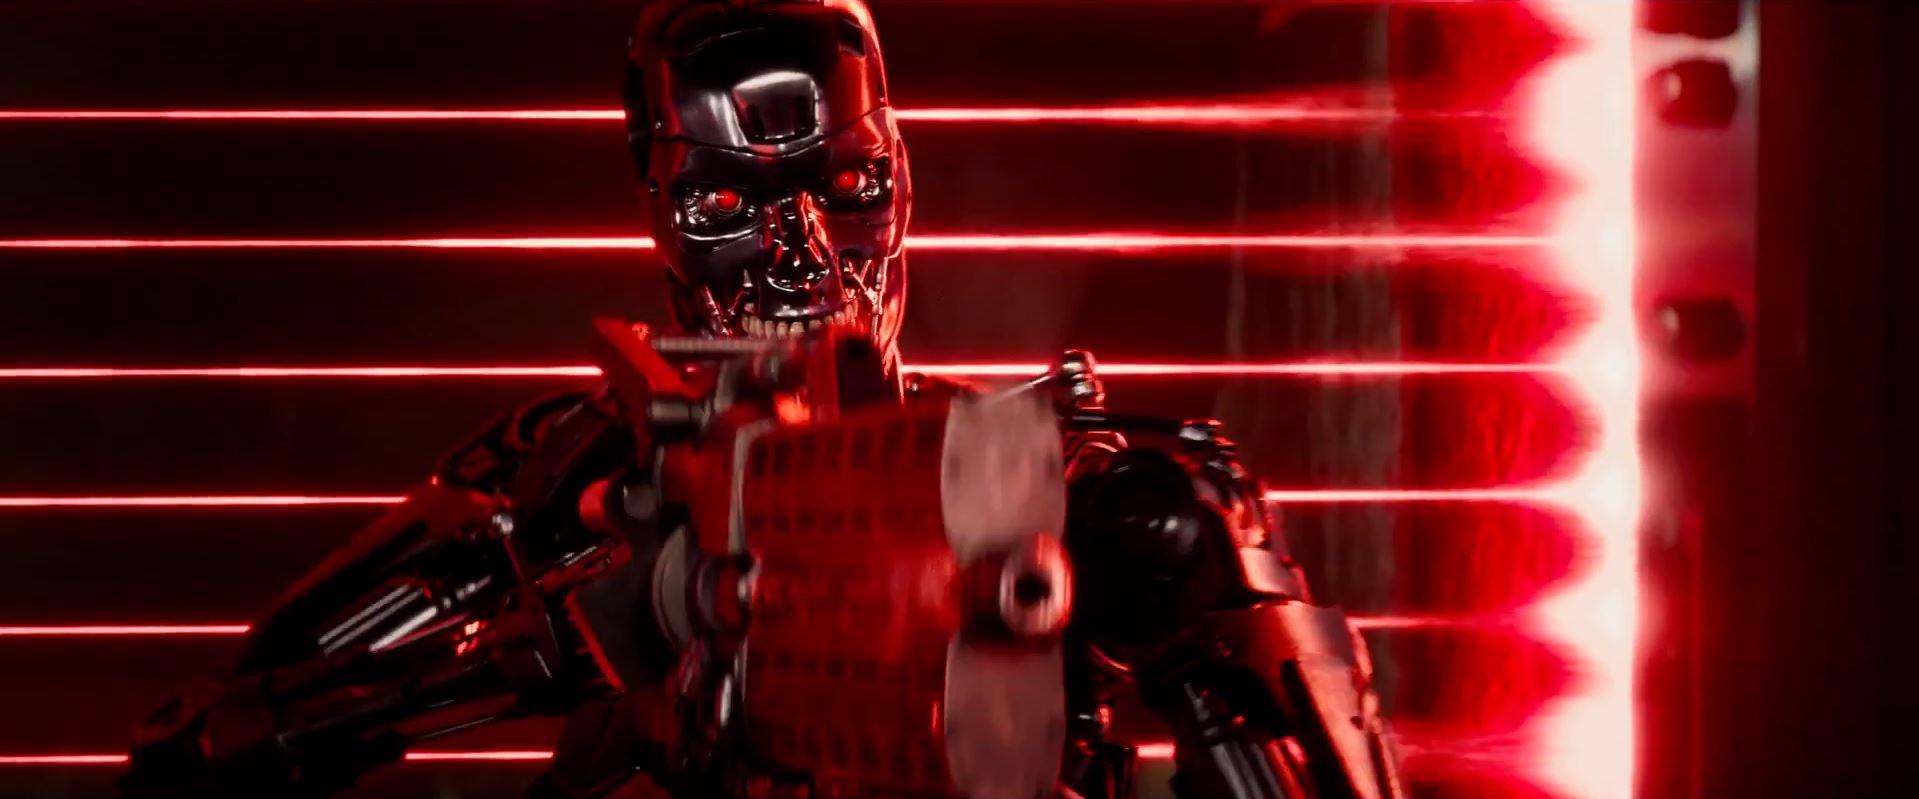 Terminator Genisys CyberDyne Systems model 101